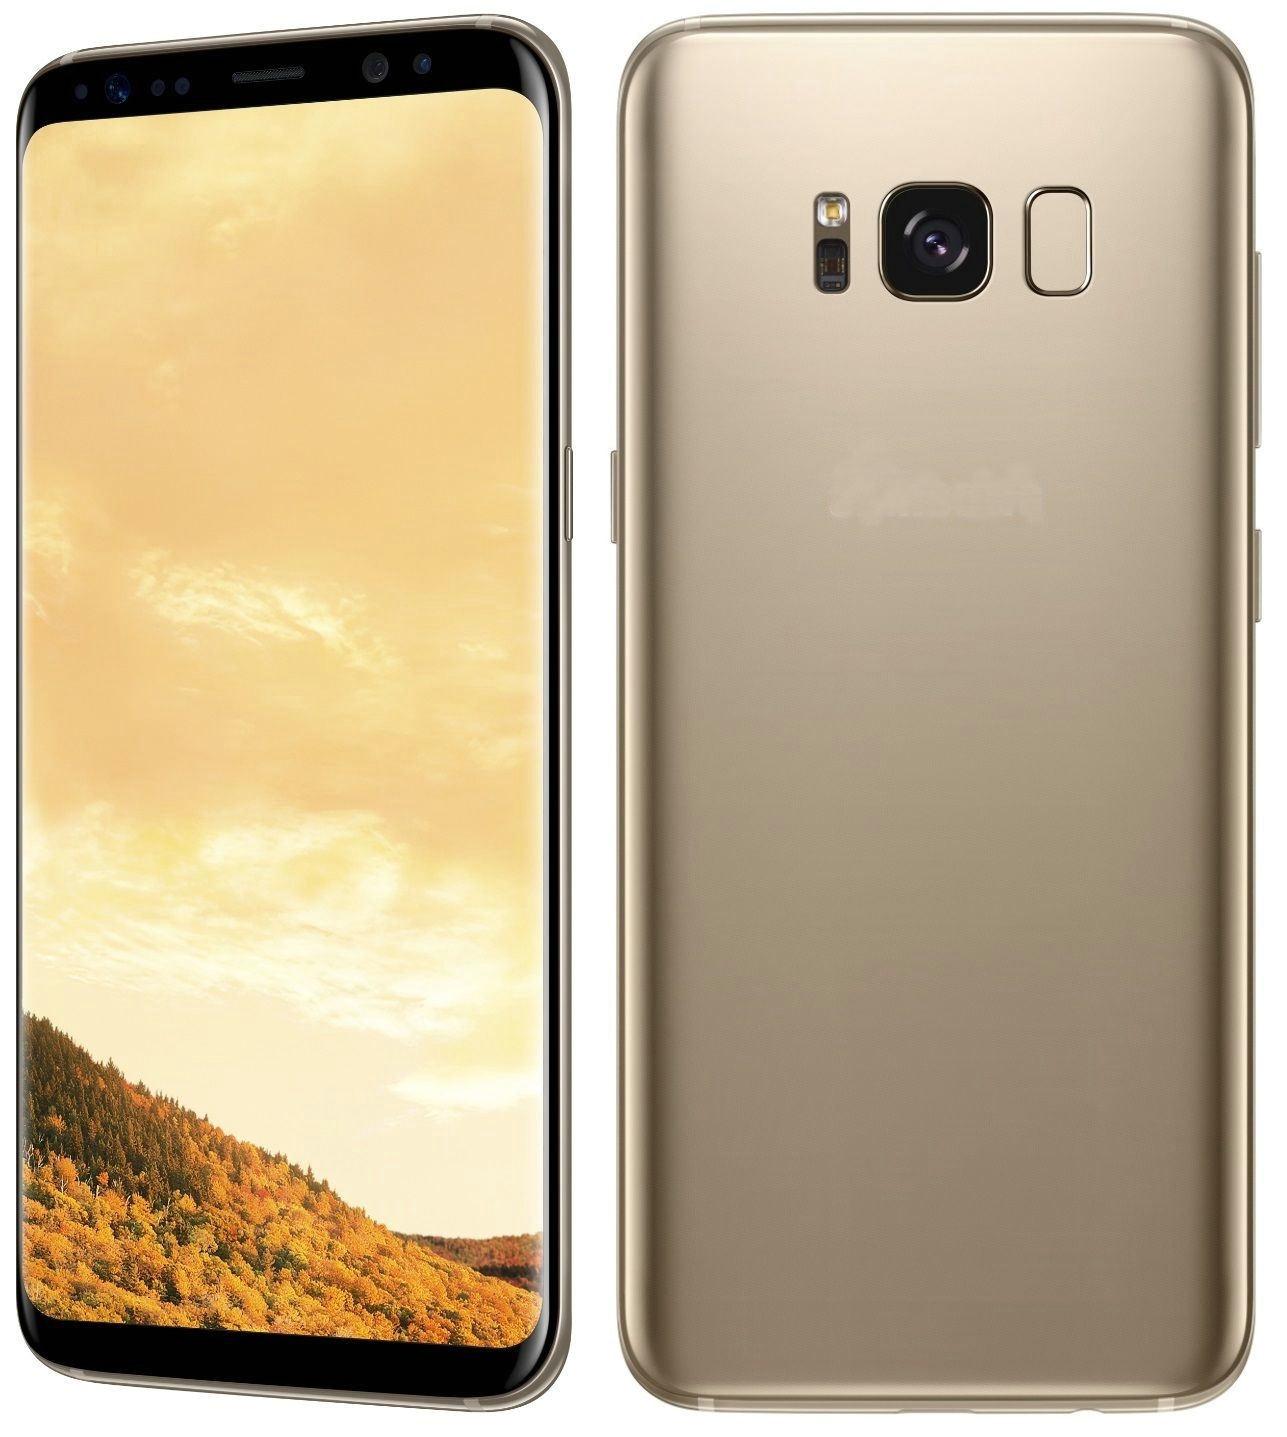 "Original 5.8"" Mobile Phone S8 Unlocked Smart Cell Phone"